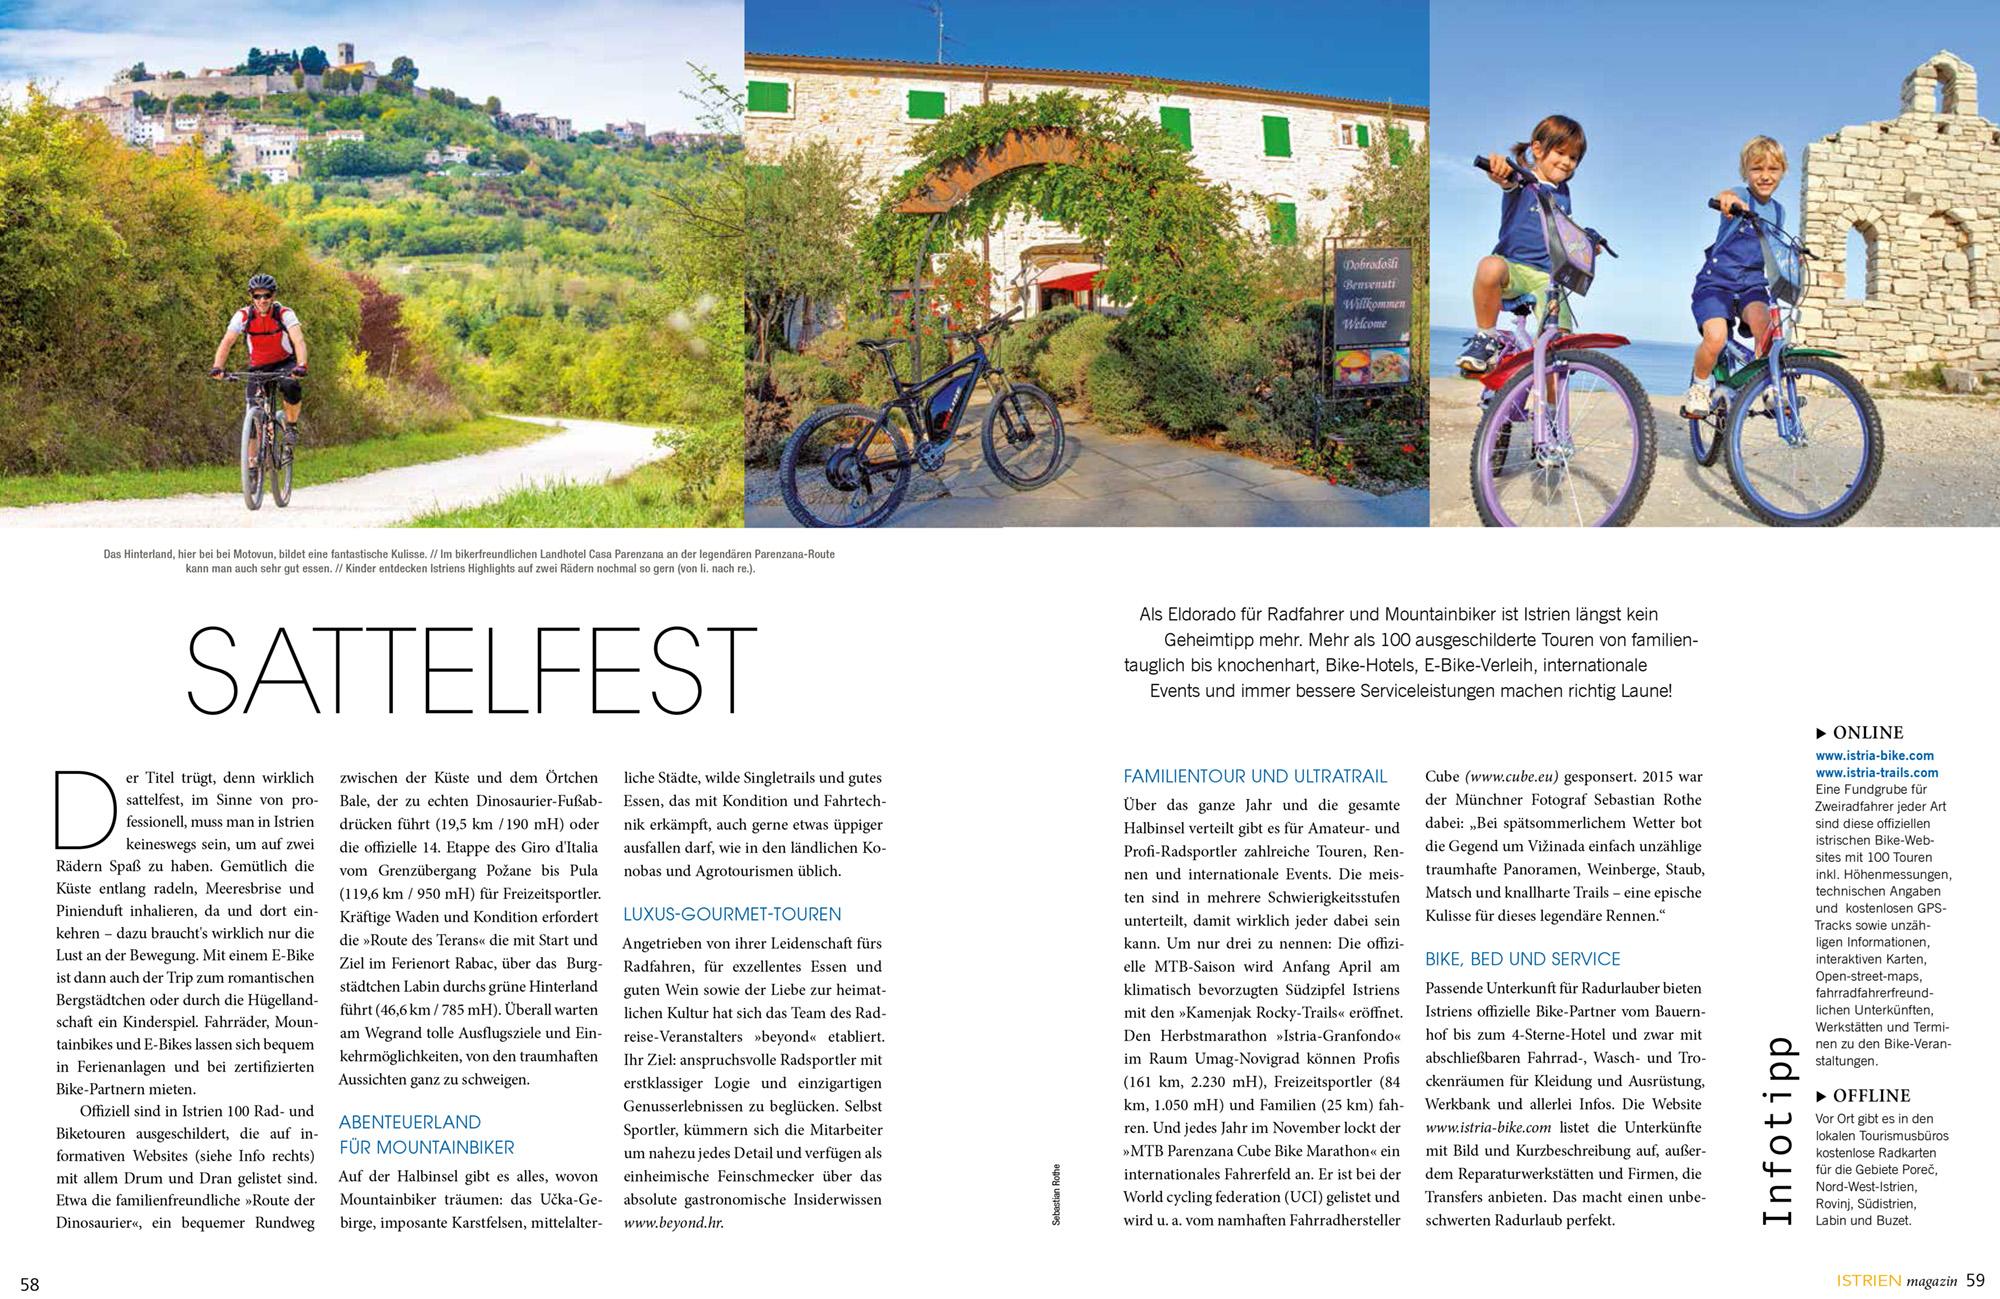 IstrienMagazin2016-58.jpg